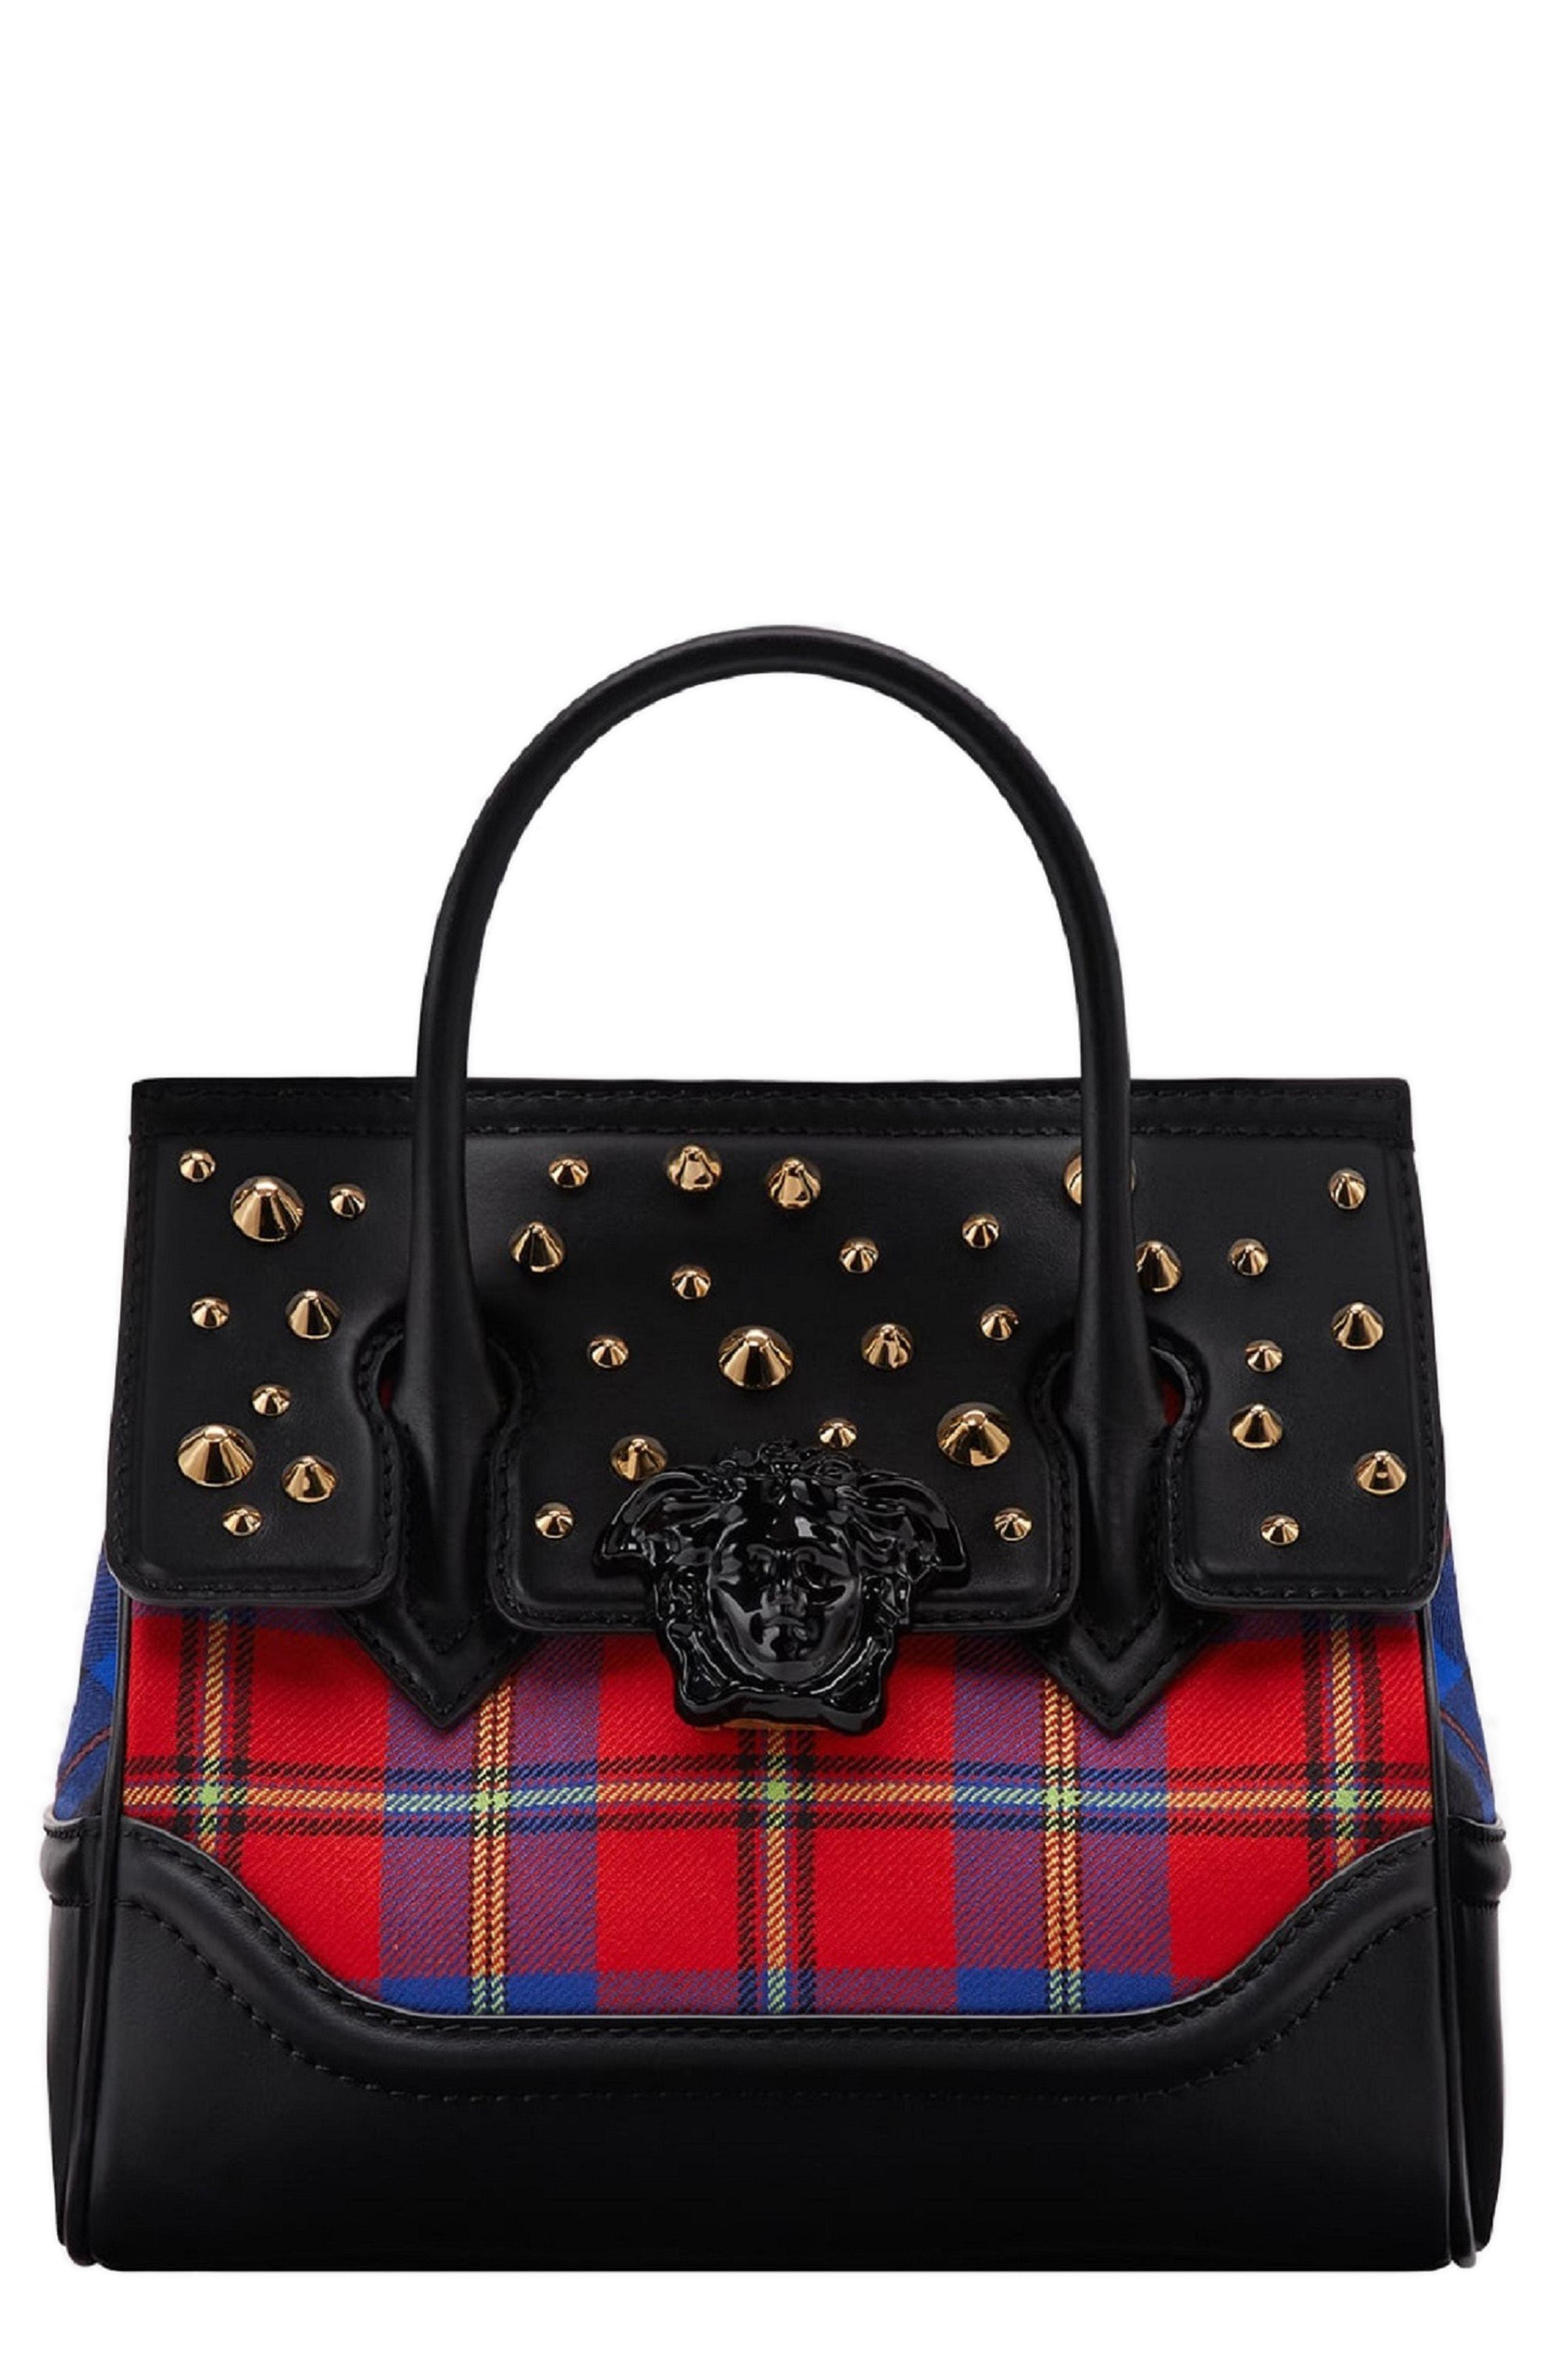 690e1b3793 Lyst - Versace Medium Clash Palazzo Empire Satchel - in Black